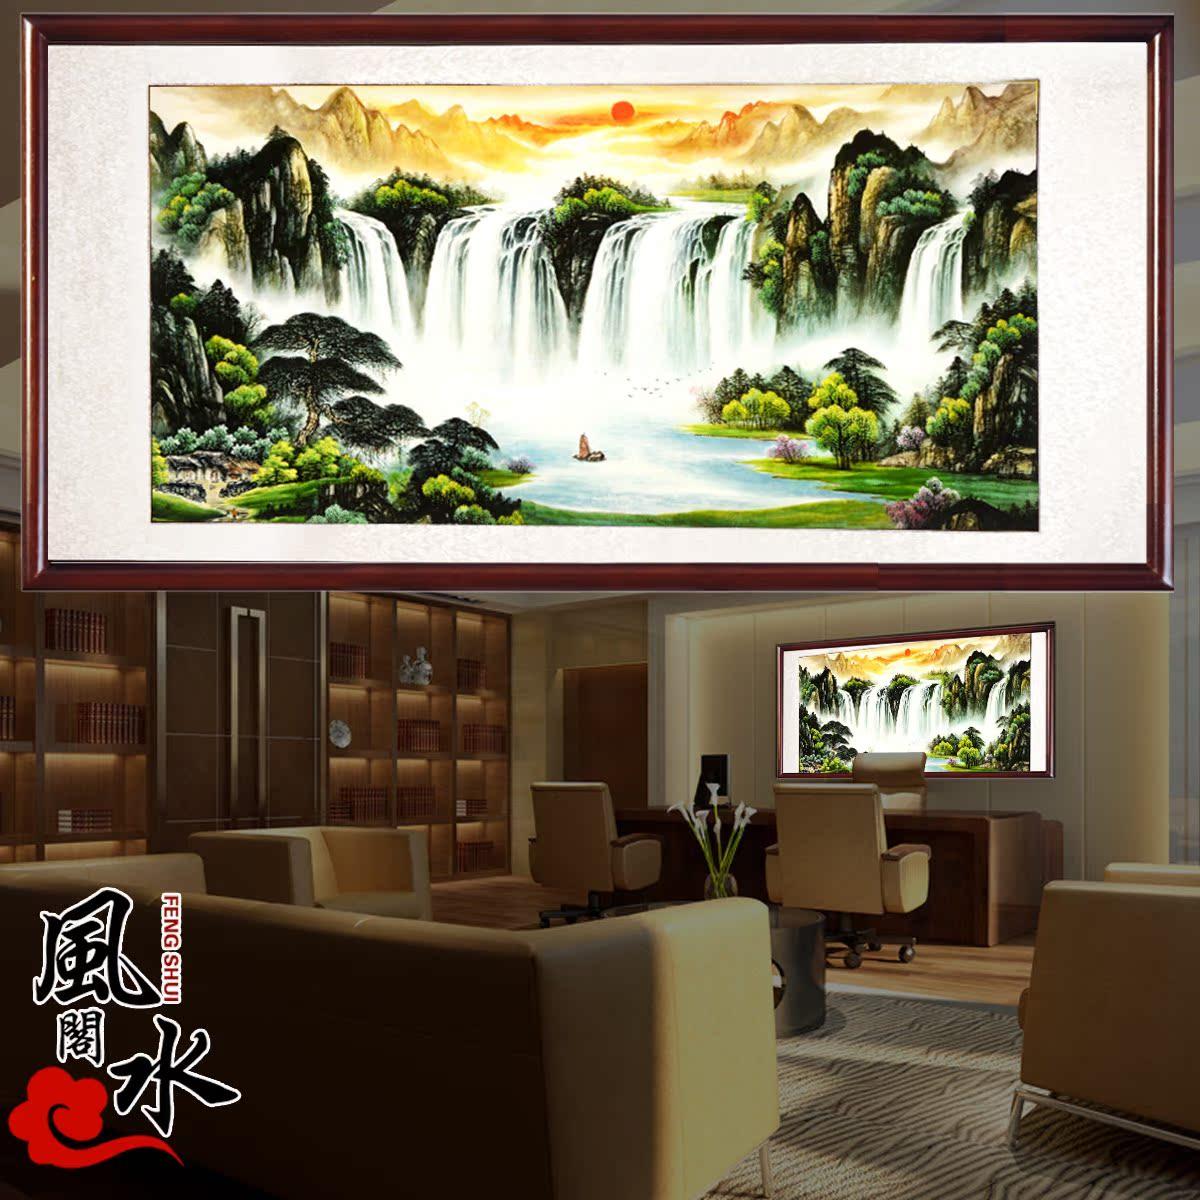 Buy European Cornucopia Feng Shui Landscape Painting Chinese